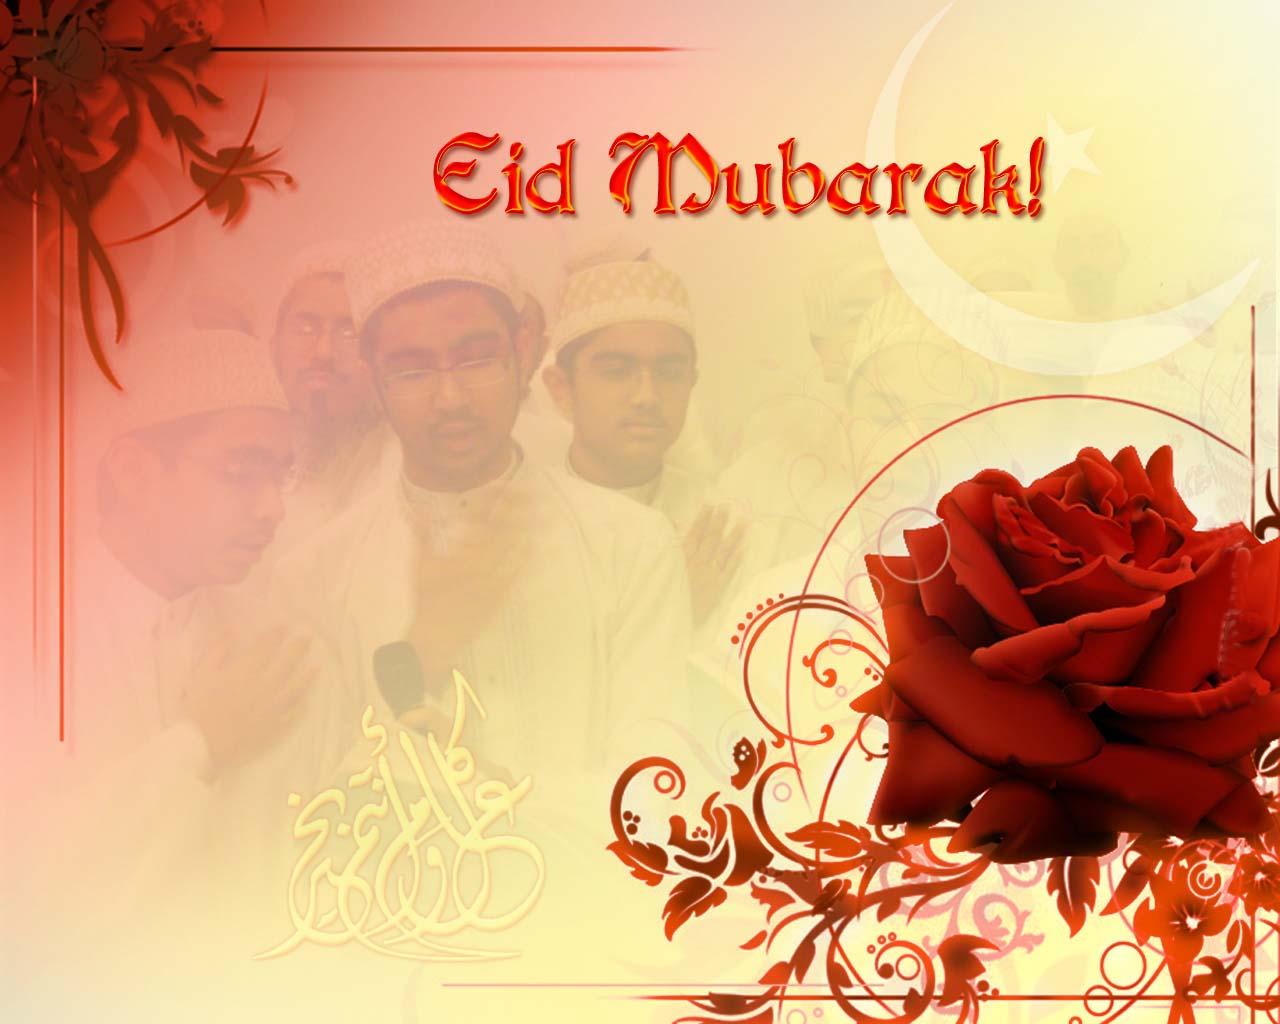 Hd widescreen backgrounds wallpapers best 25 eid wallpaper eid beautiful eid ul adha for wallpapers 12 kristyandbryce Choice Image